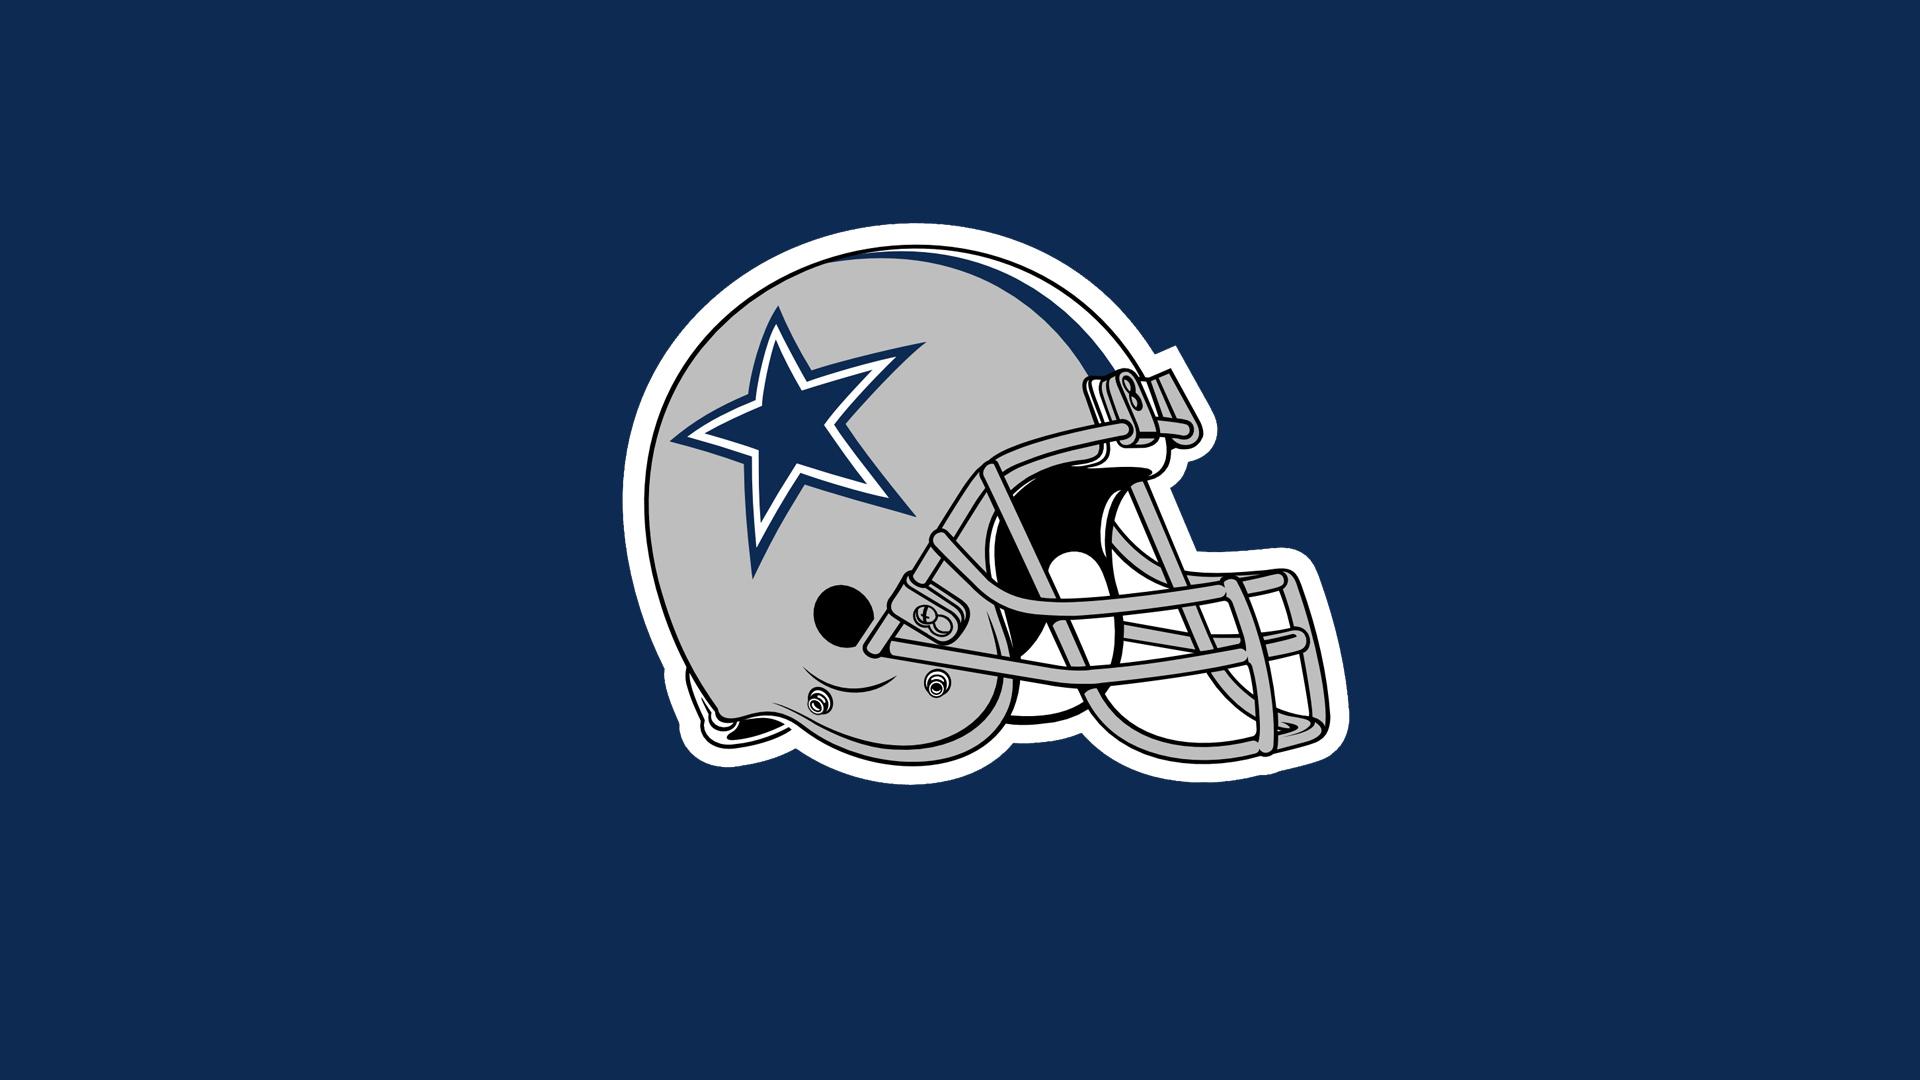 NFL Dallas Cowboys Helmet Blue Back 1920x1080 HD NFL Dallas Cowboys 1920x1080